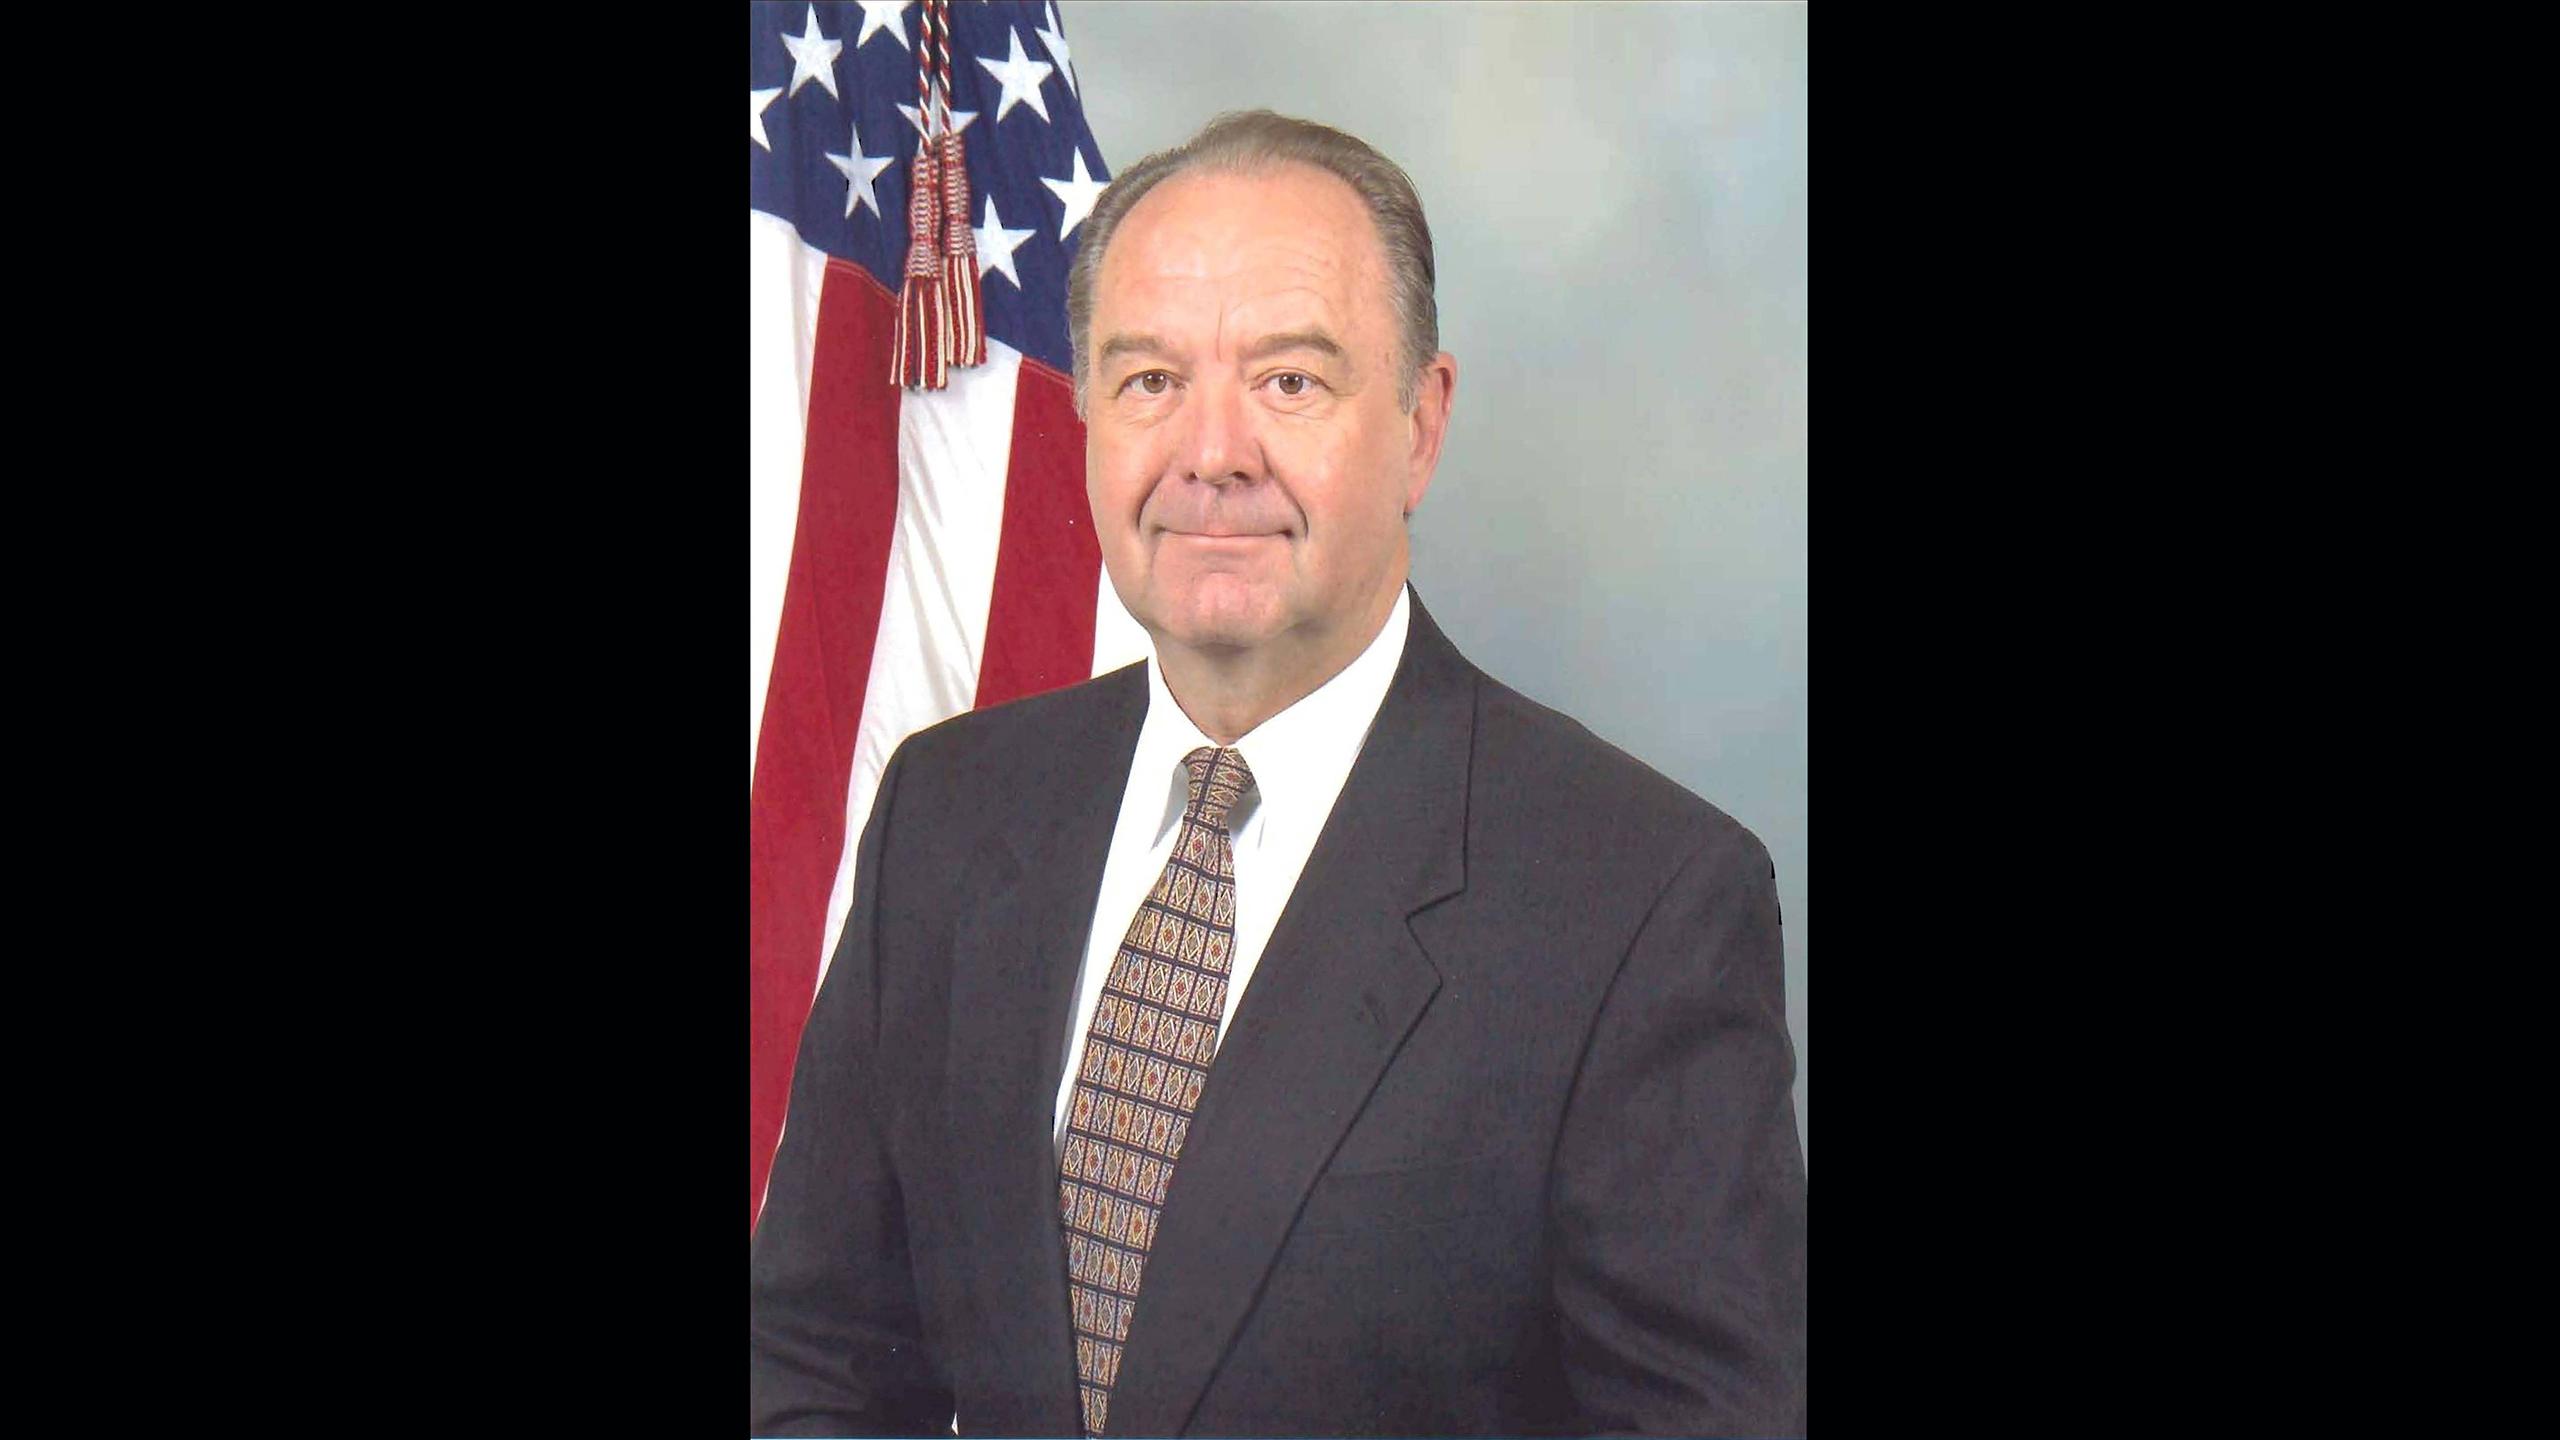 DLA Distribution Barstow, California, honors retiring director